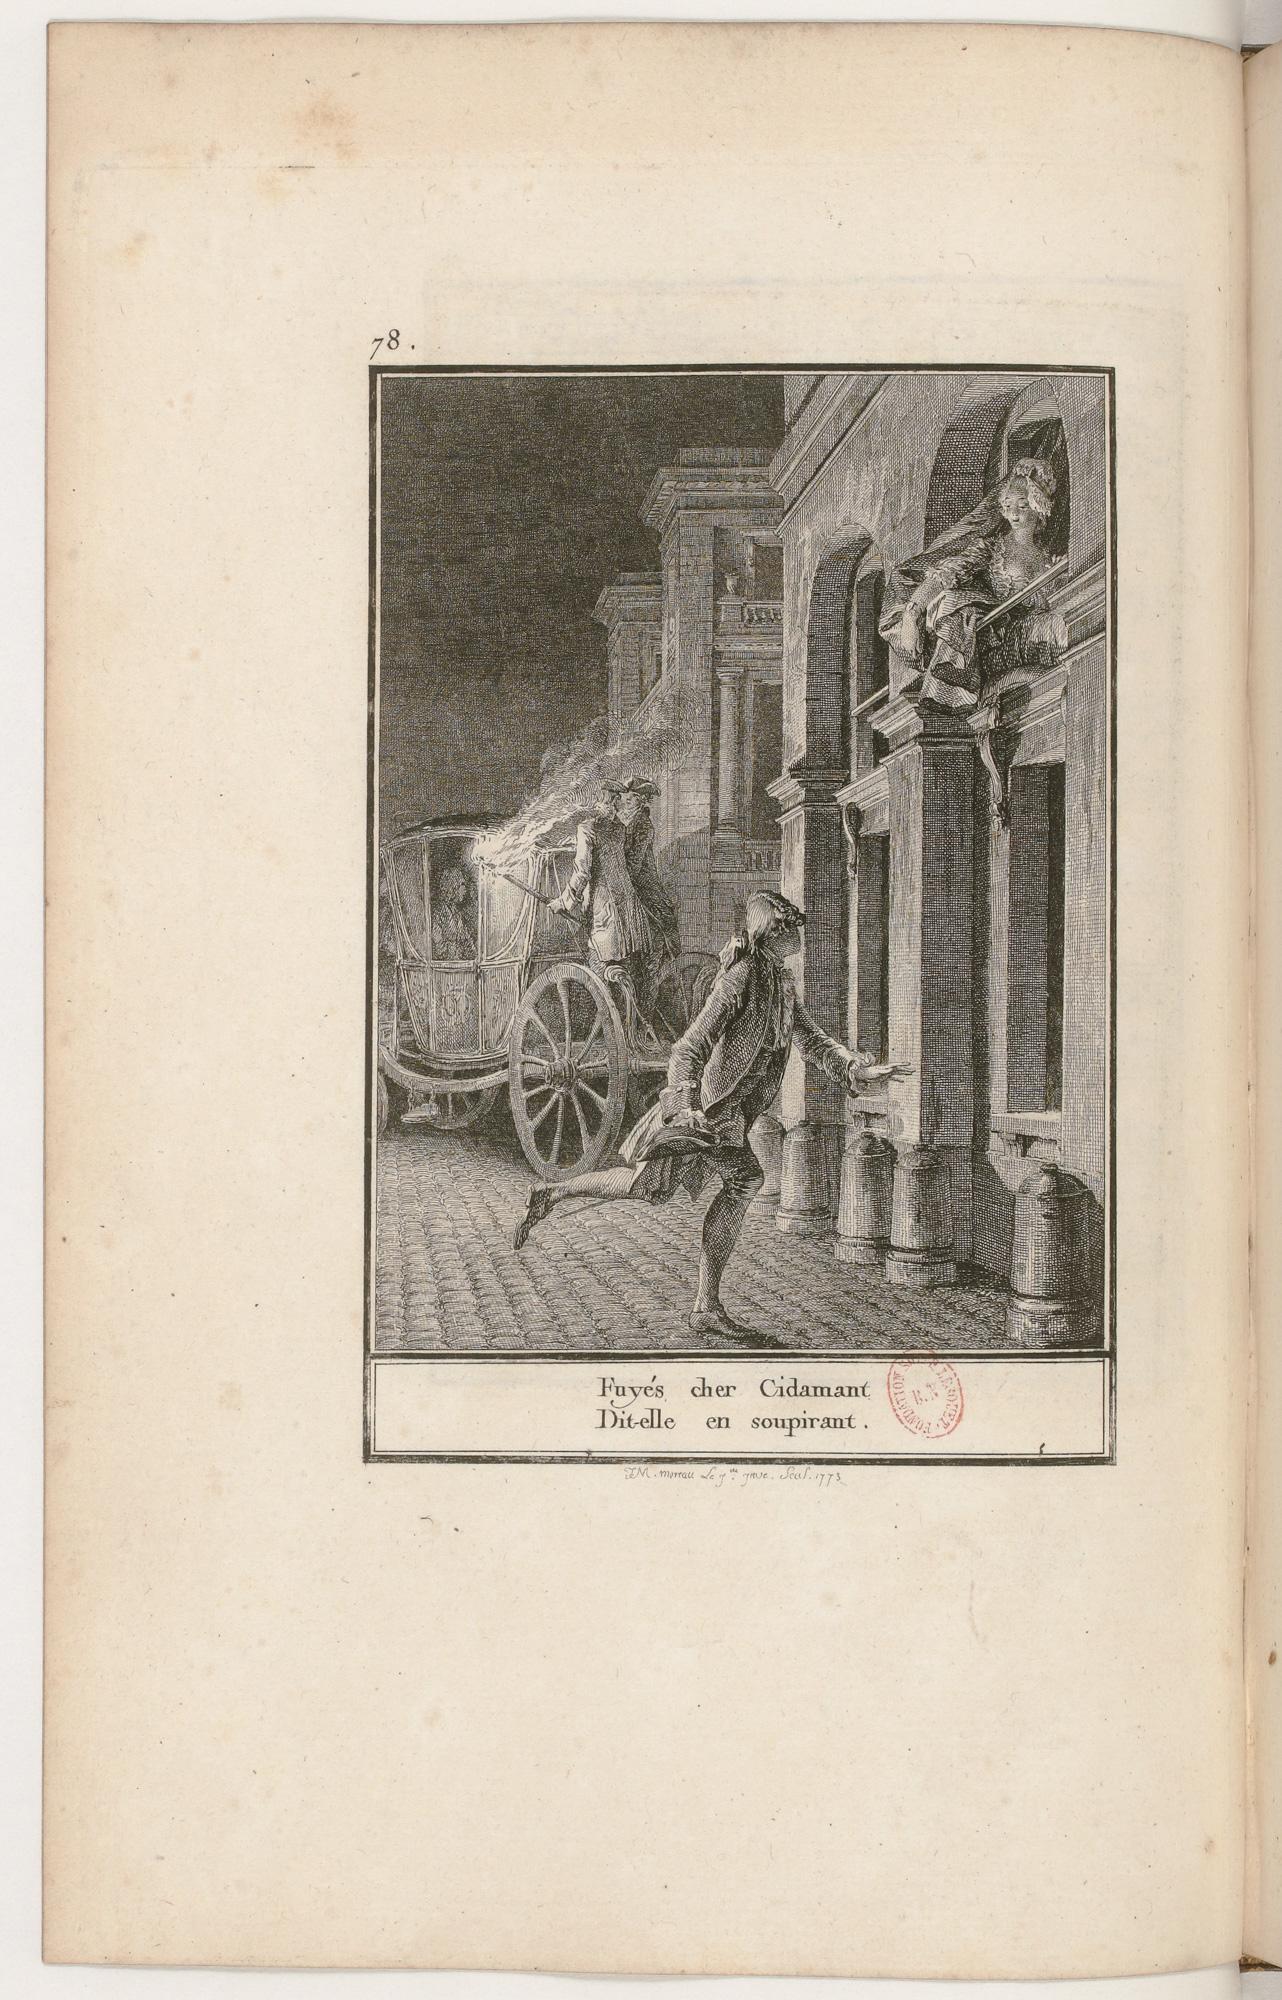 S.1.13 L'heureuse nuit,1772, Image